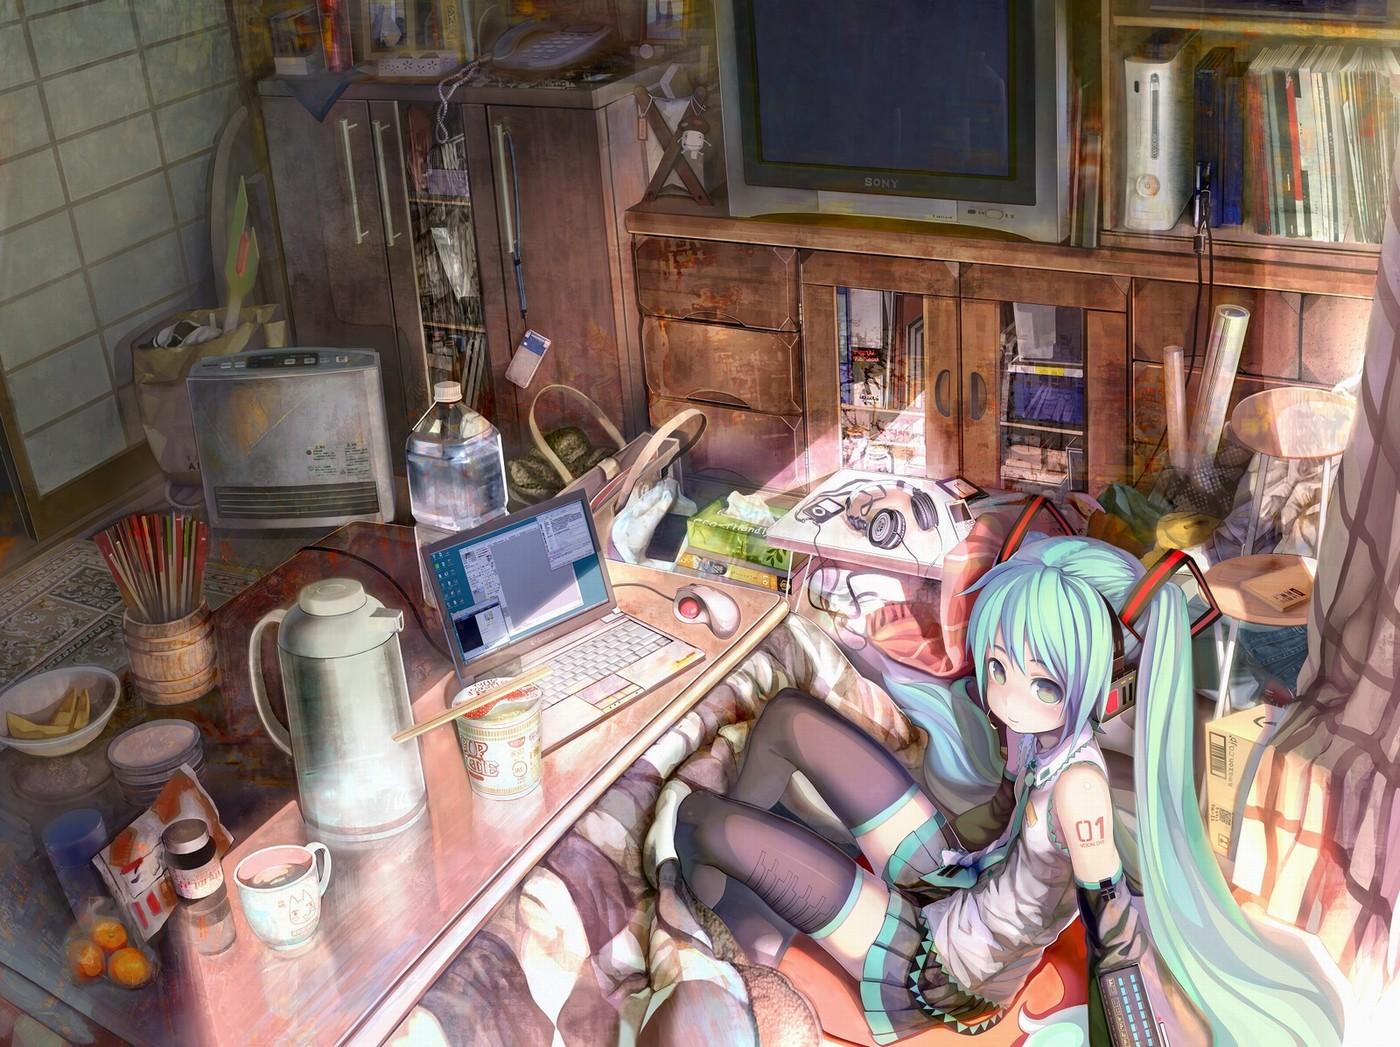 Anime 1400x1047 anime room bedroom calm anime girls interior long hair looking at viewer sitting aqua hair Windows XP notebooks computer mice Vocaloid Hatsune Miku